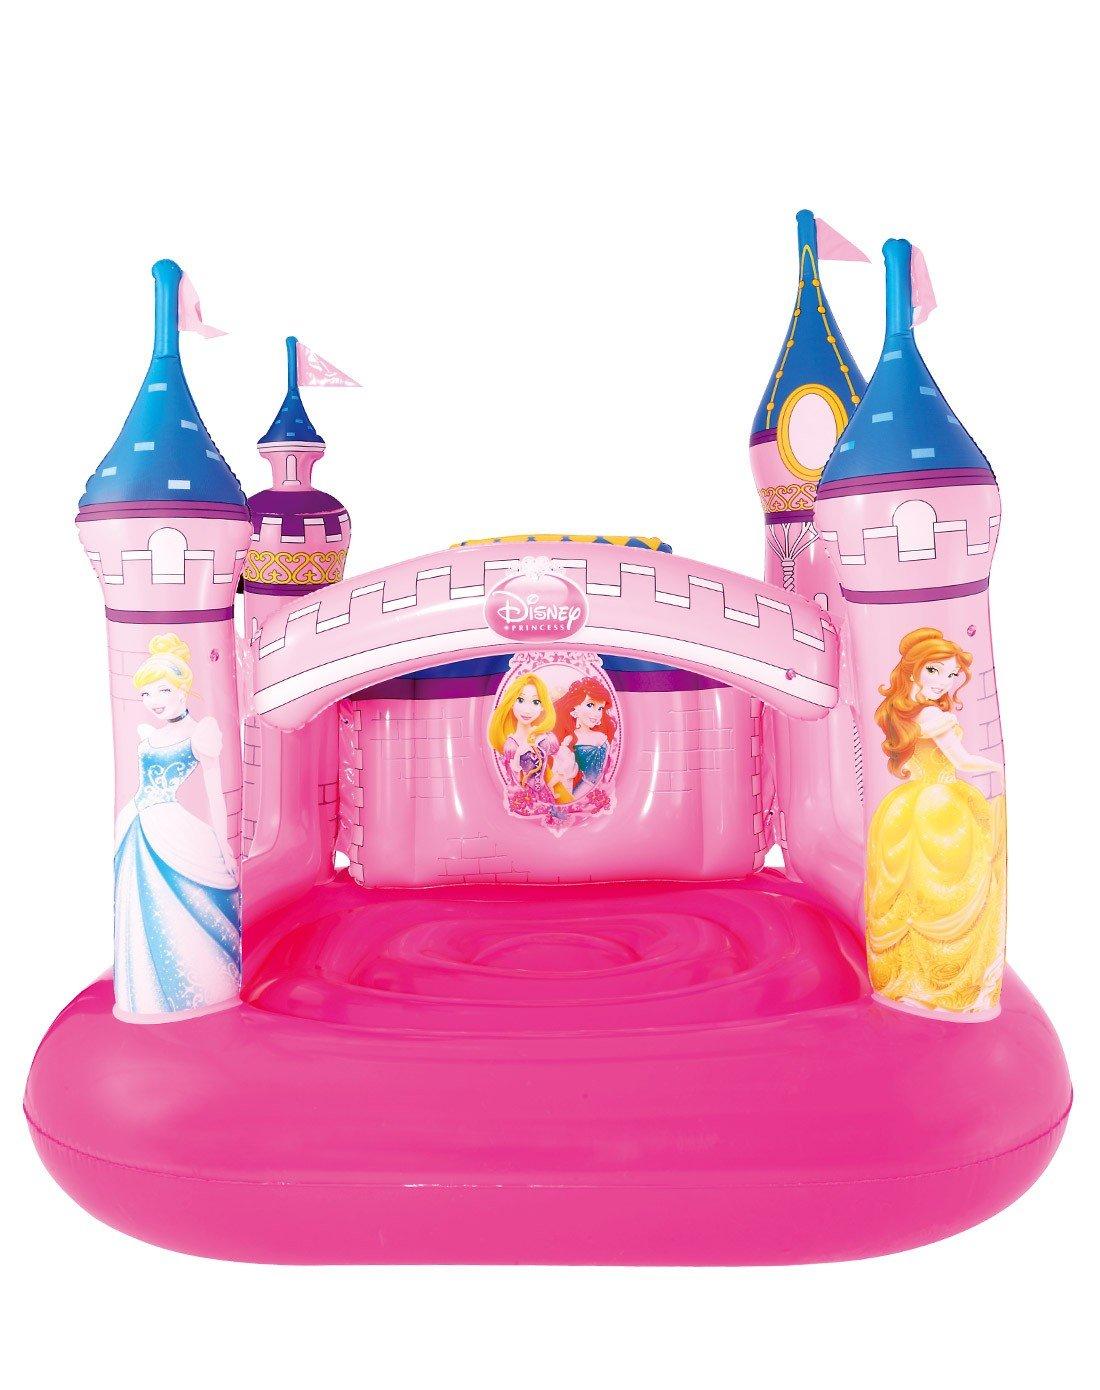 Bestway 91050B Bouncy Castle Inflatable 157 x 147 x 163 cm Disney Princesses Theme by SportsCenter